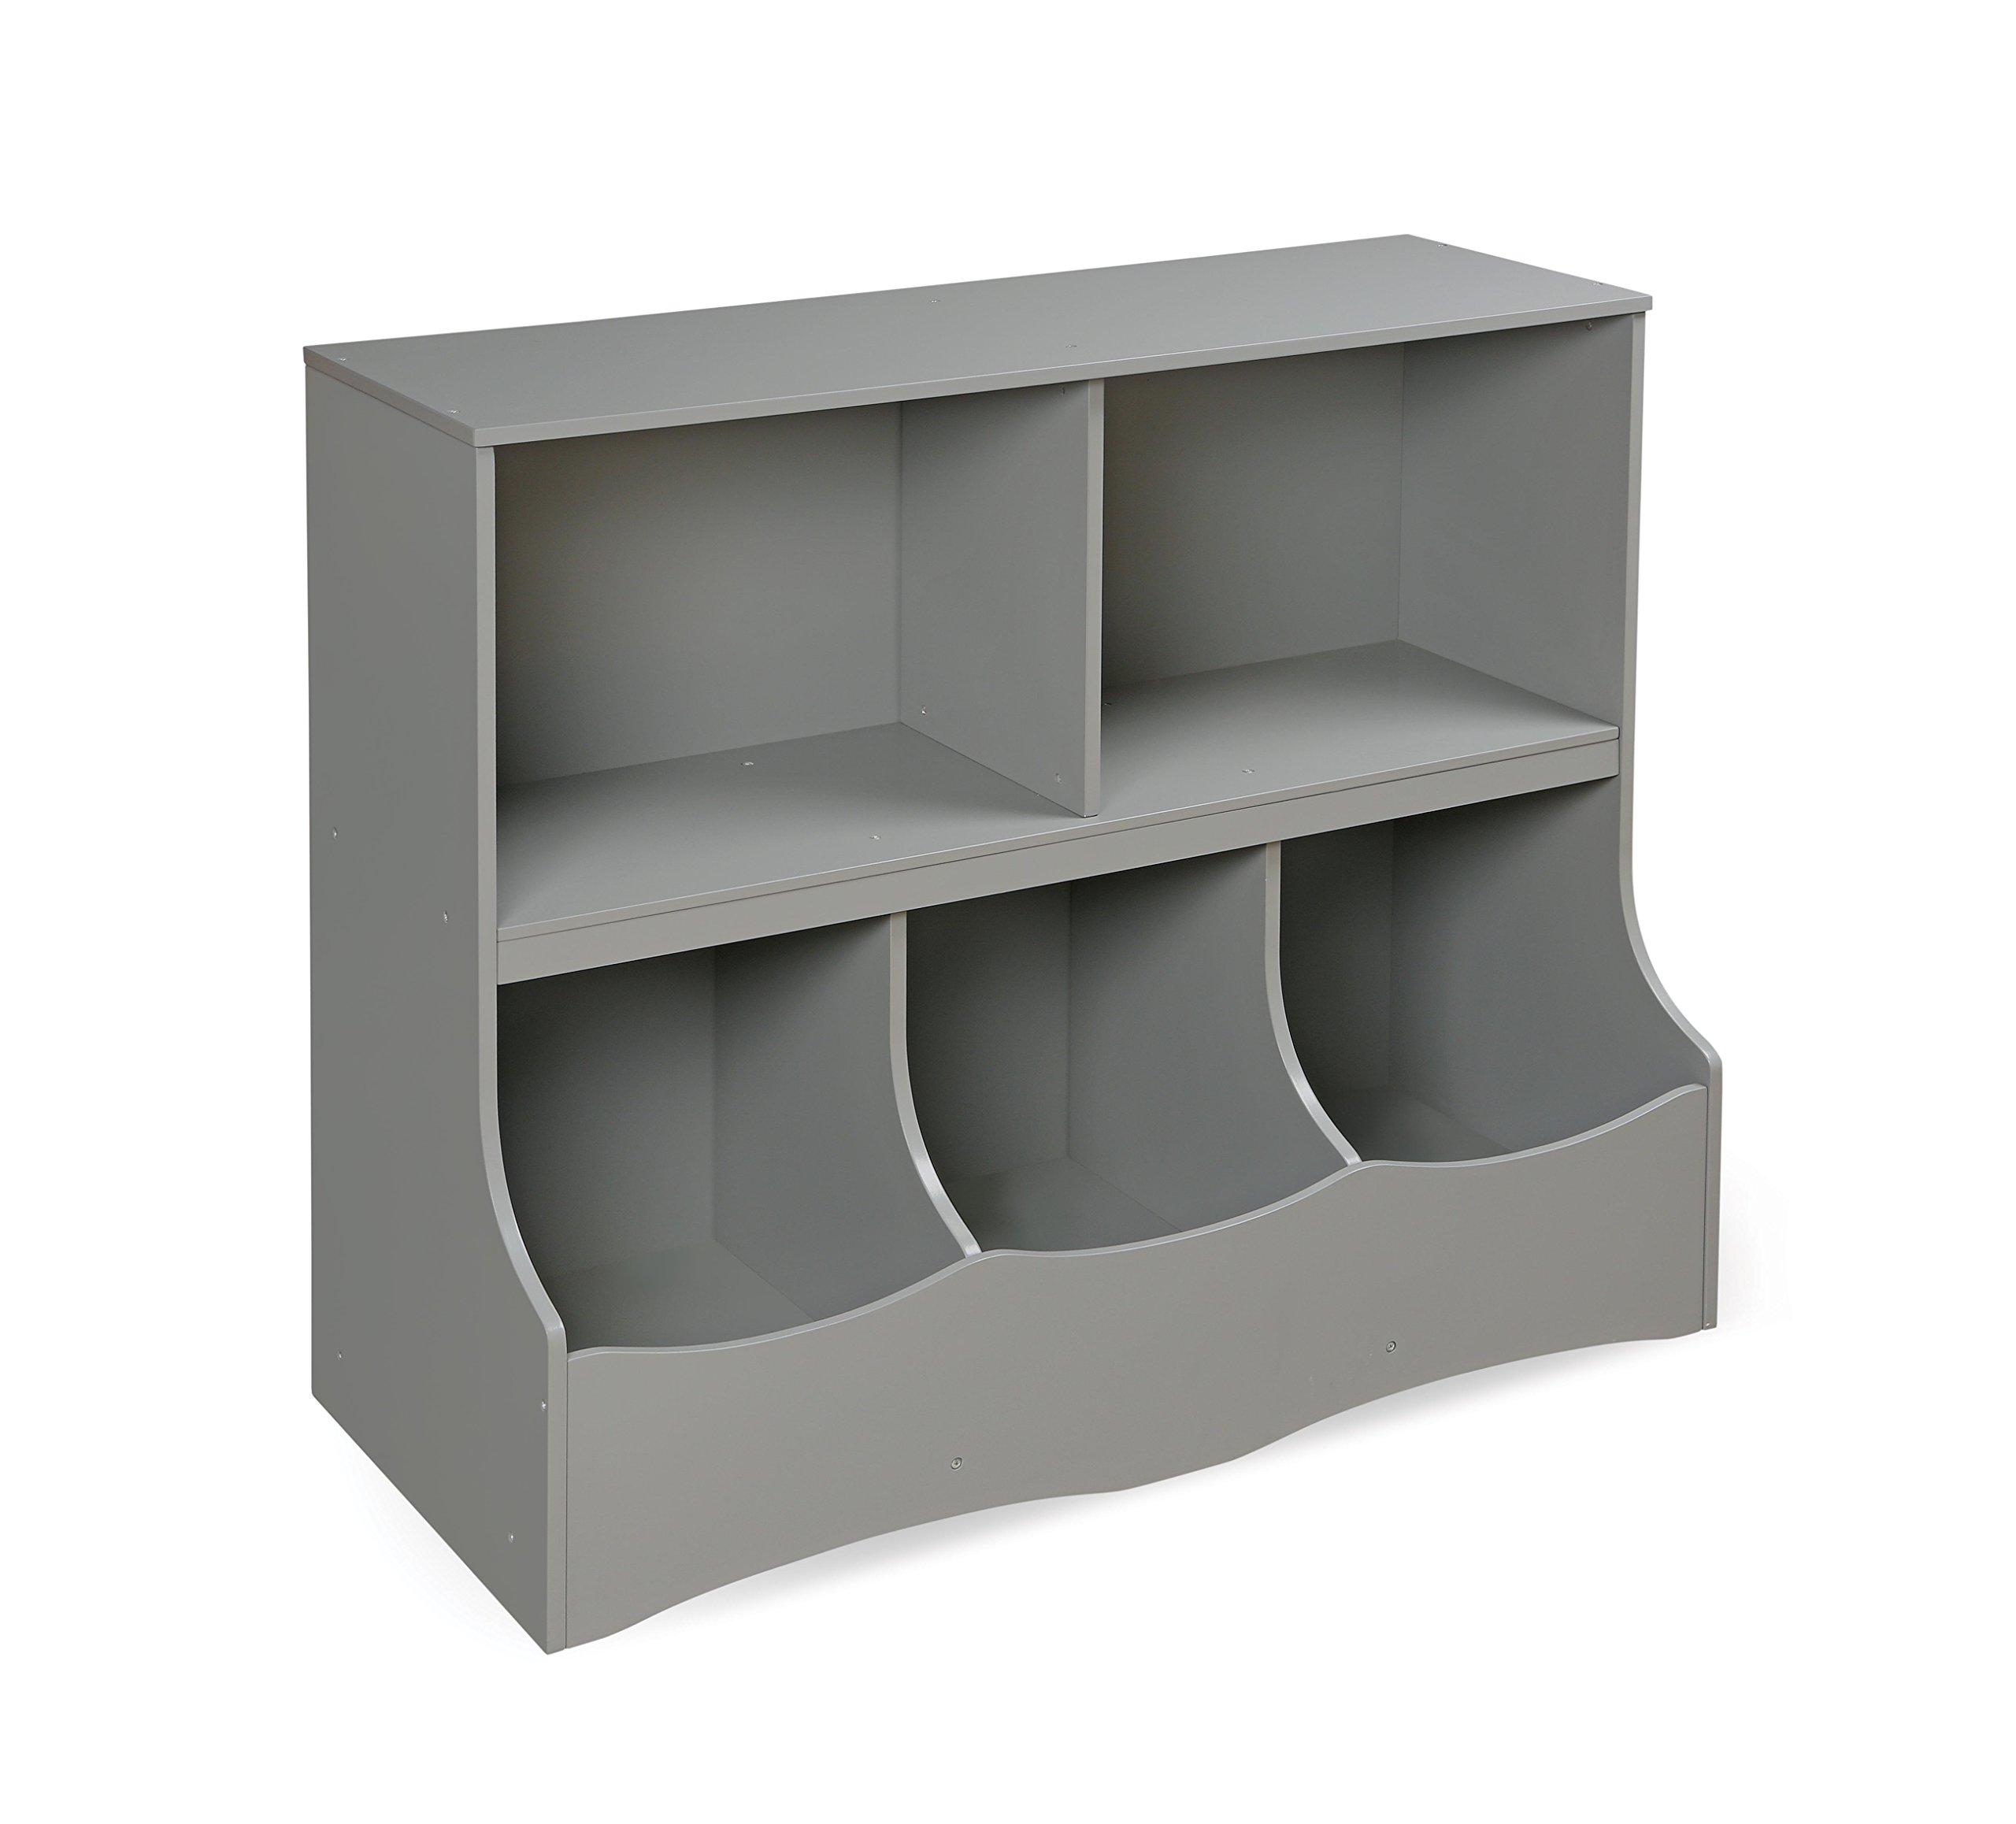 Multi-Bin Storage Organization 2 Shelf and 3 Bin Cubby Unit